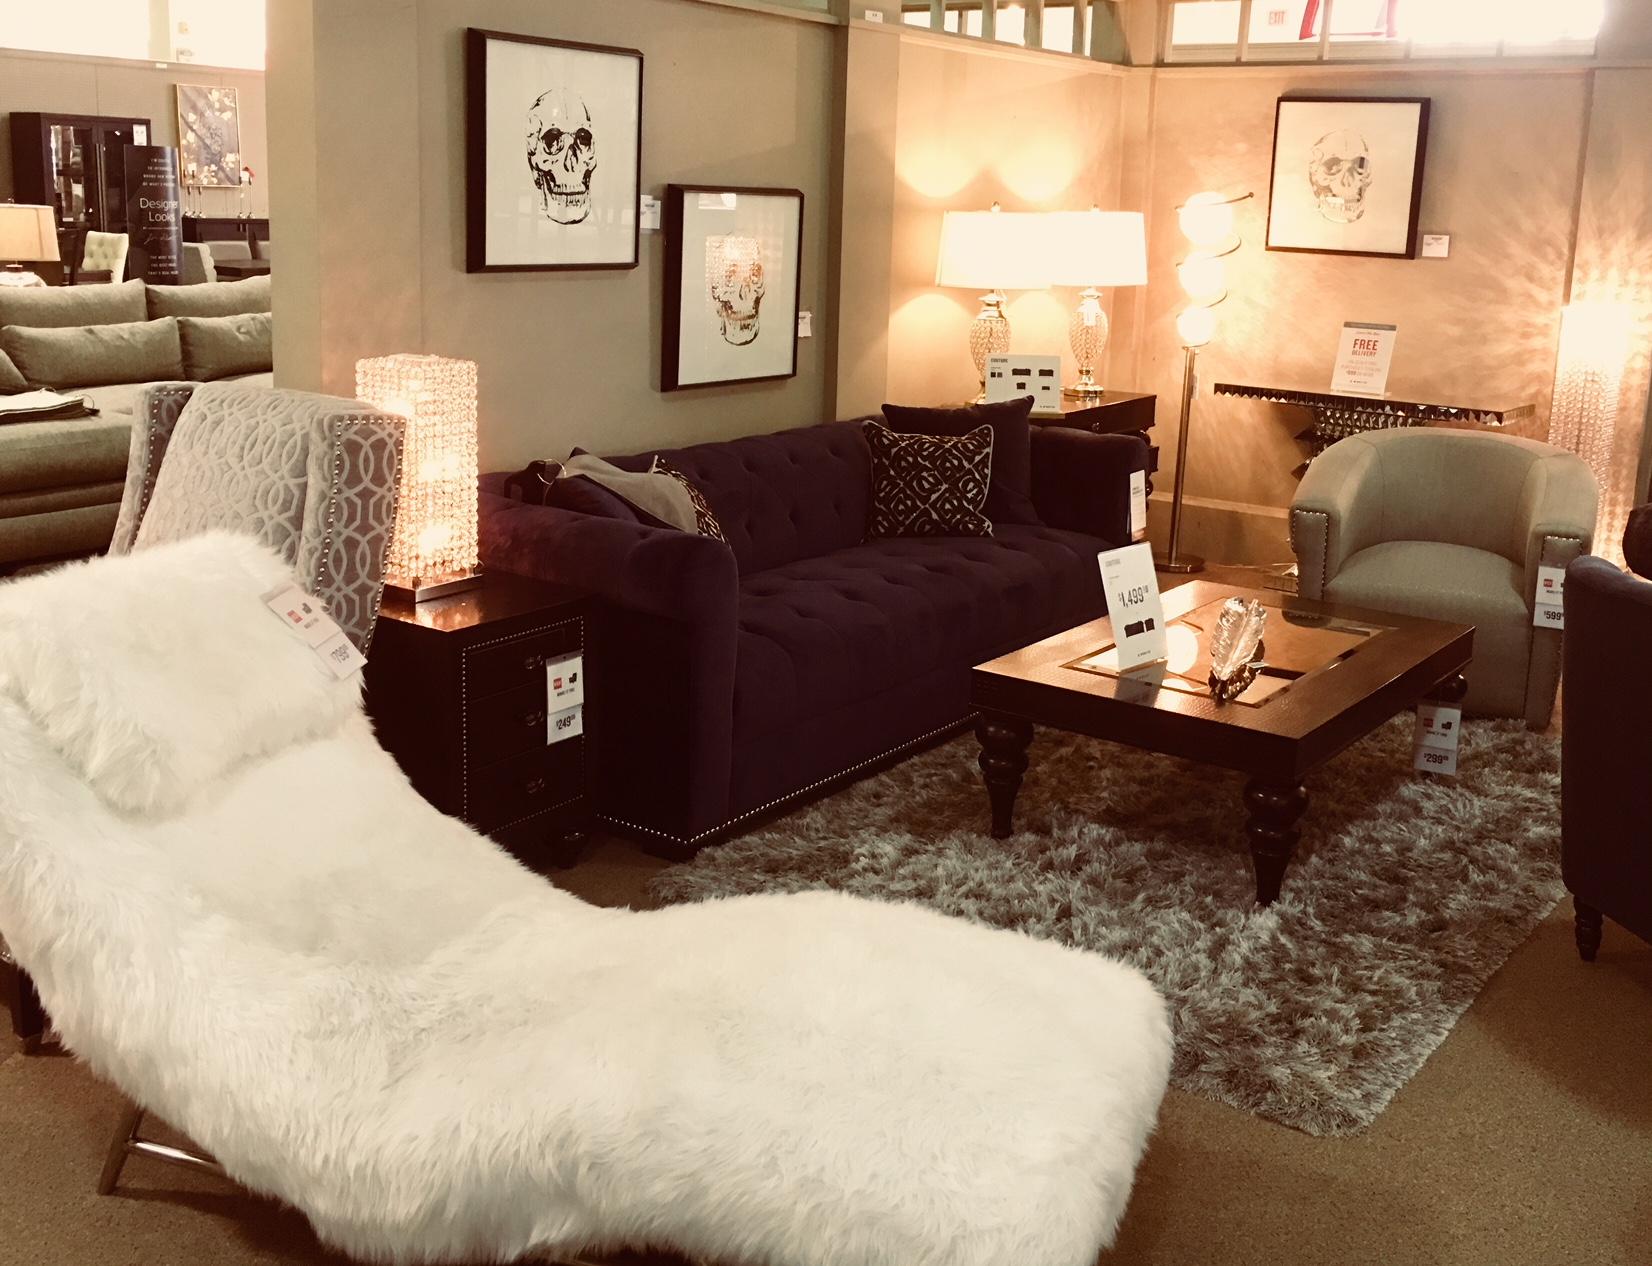 Value City Furniture image 7